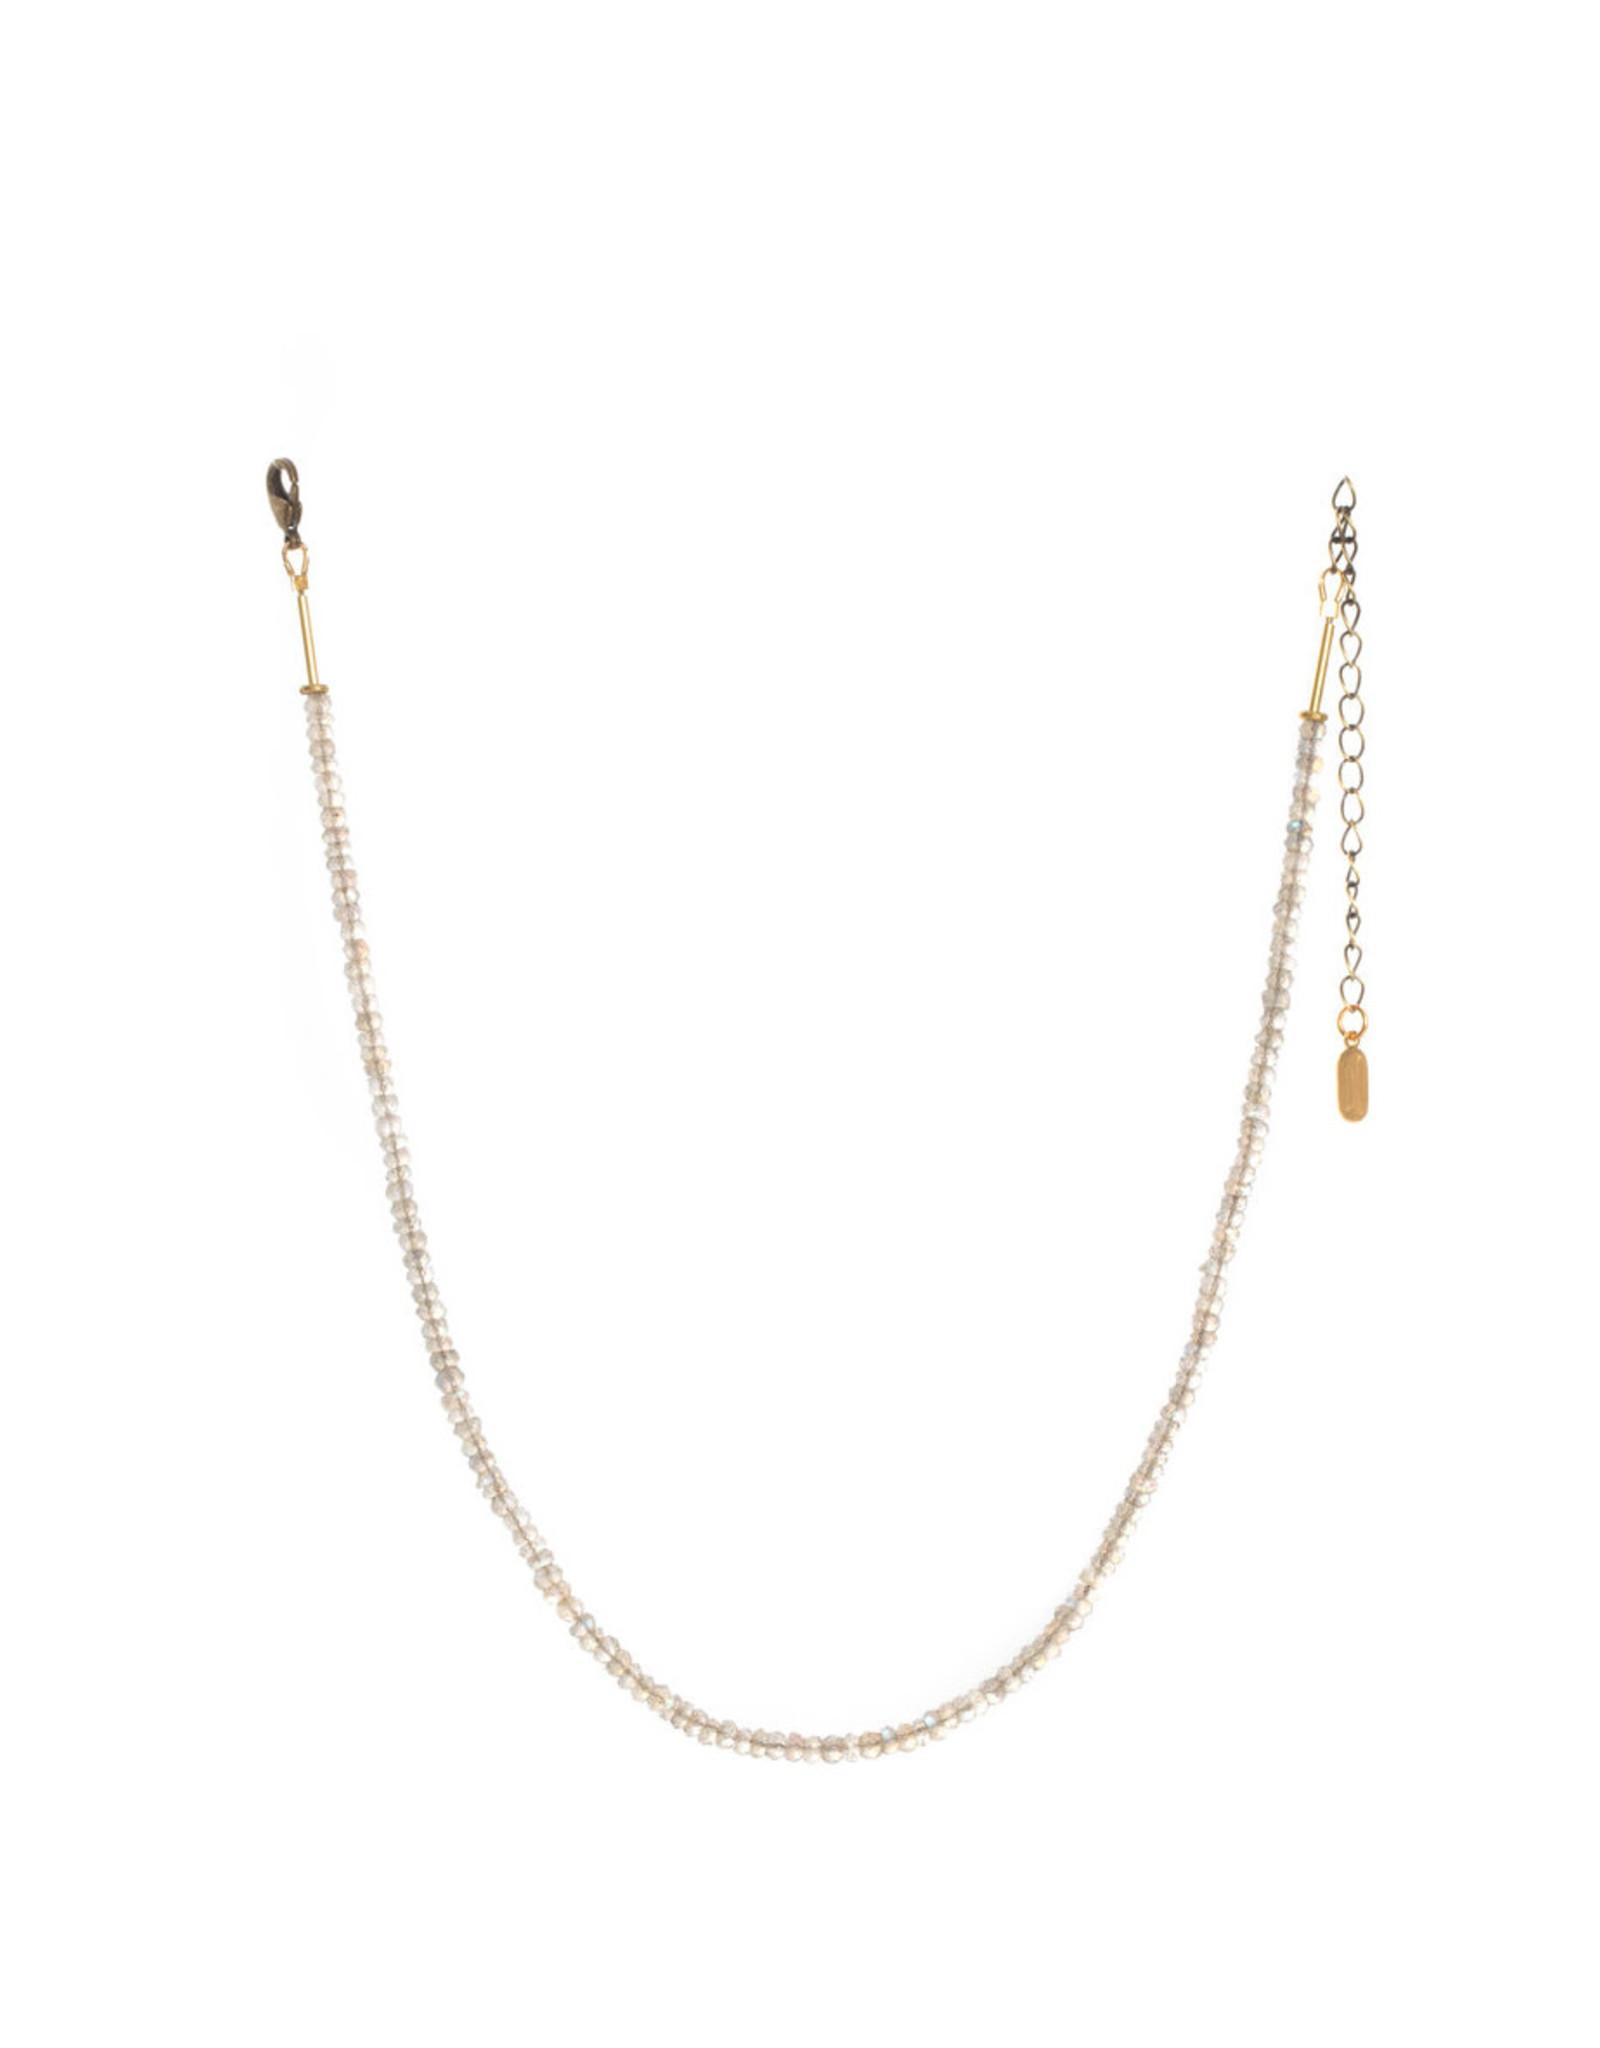 Hailey Gerrits Designs Stone Choker Necklace - Labradorite